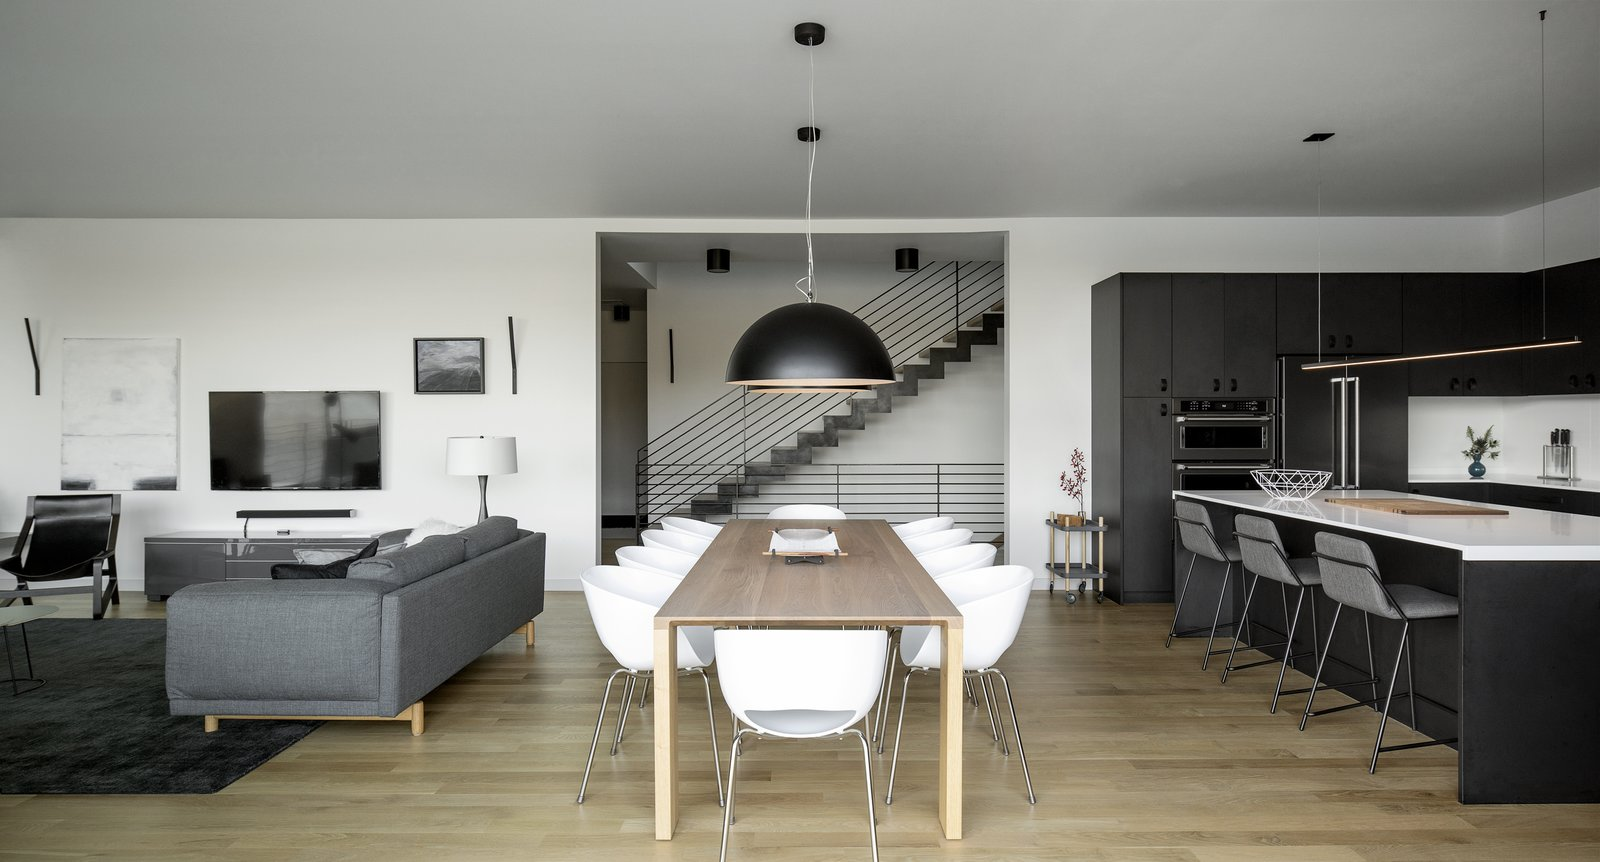 Dining Room with steel stair beyond.  Riverwood